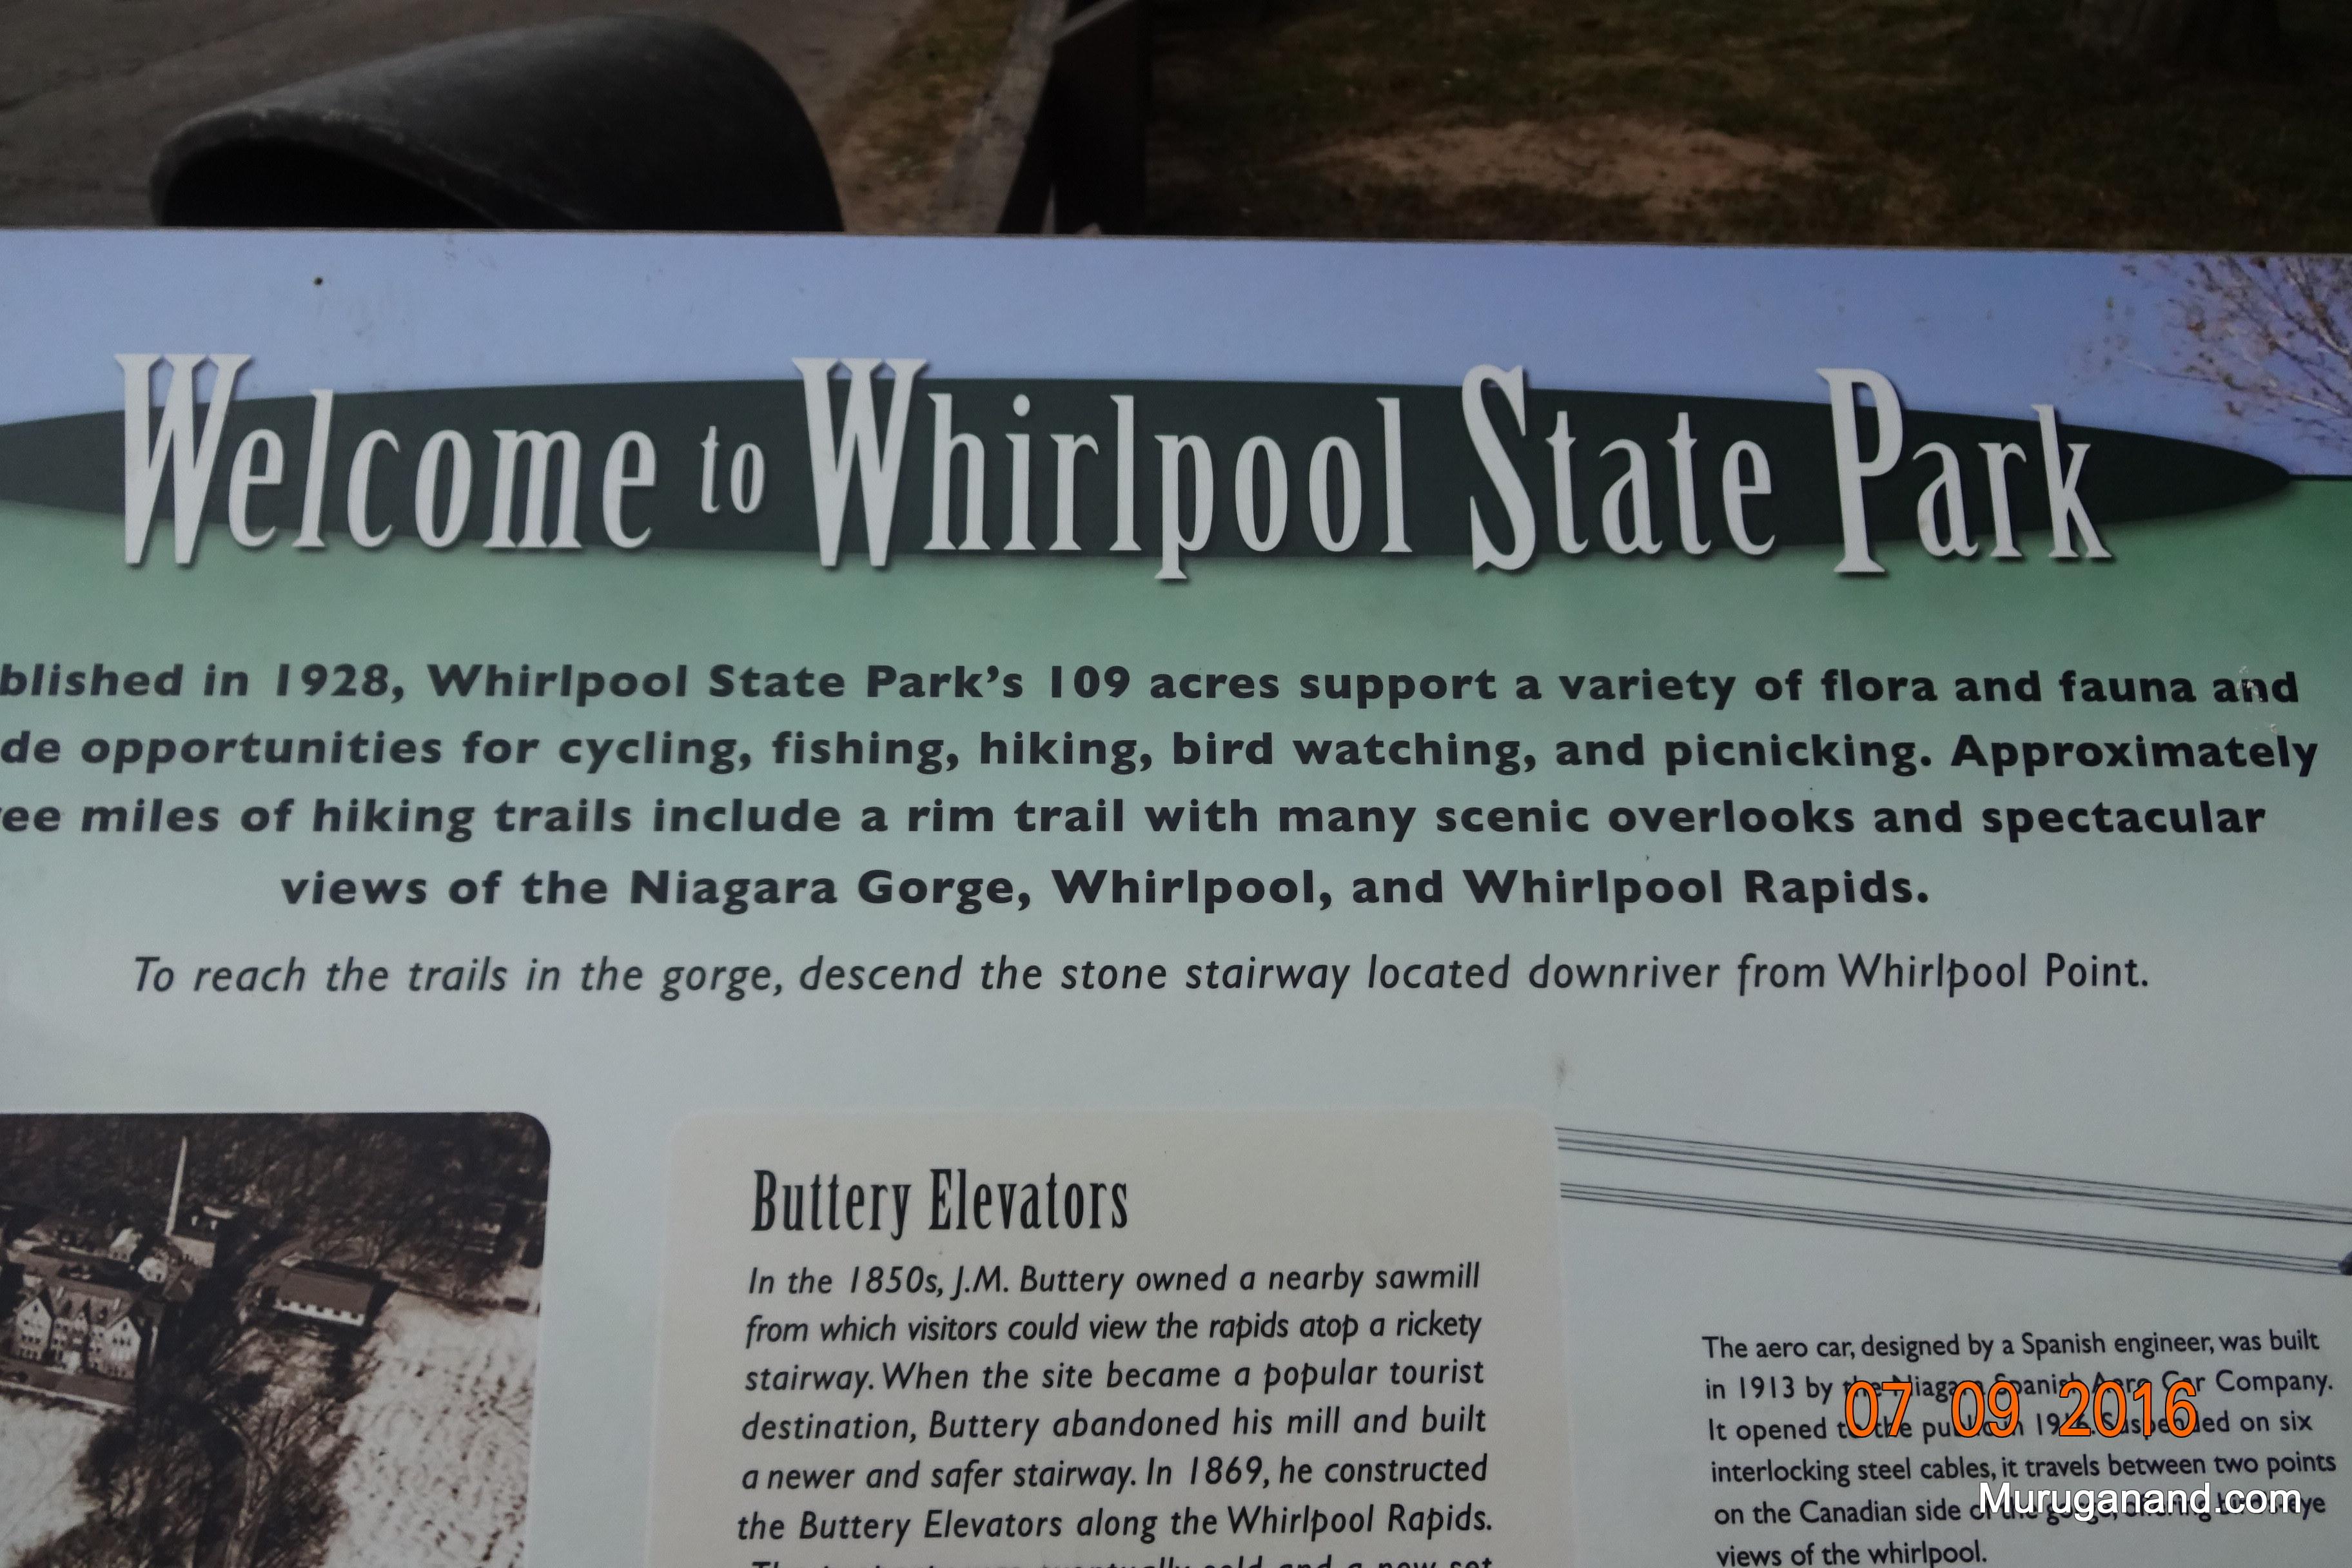 We visited Whirlpool Sate park.